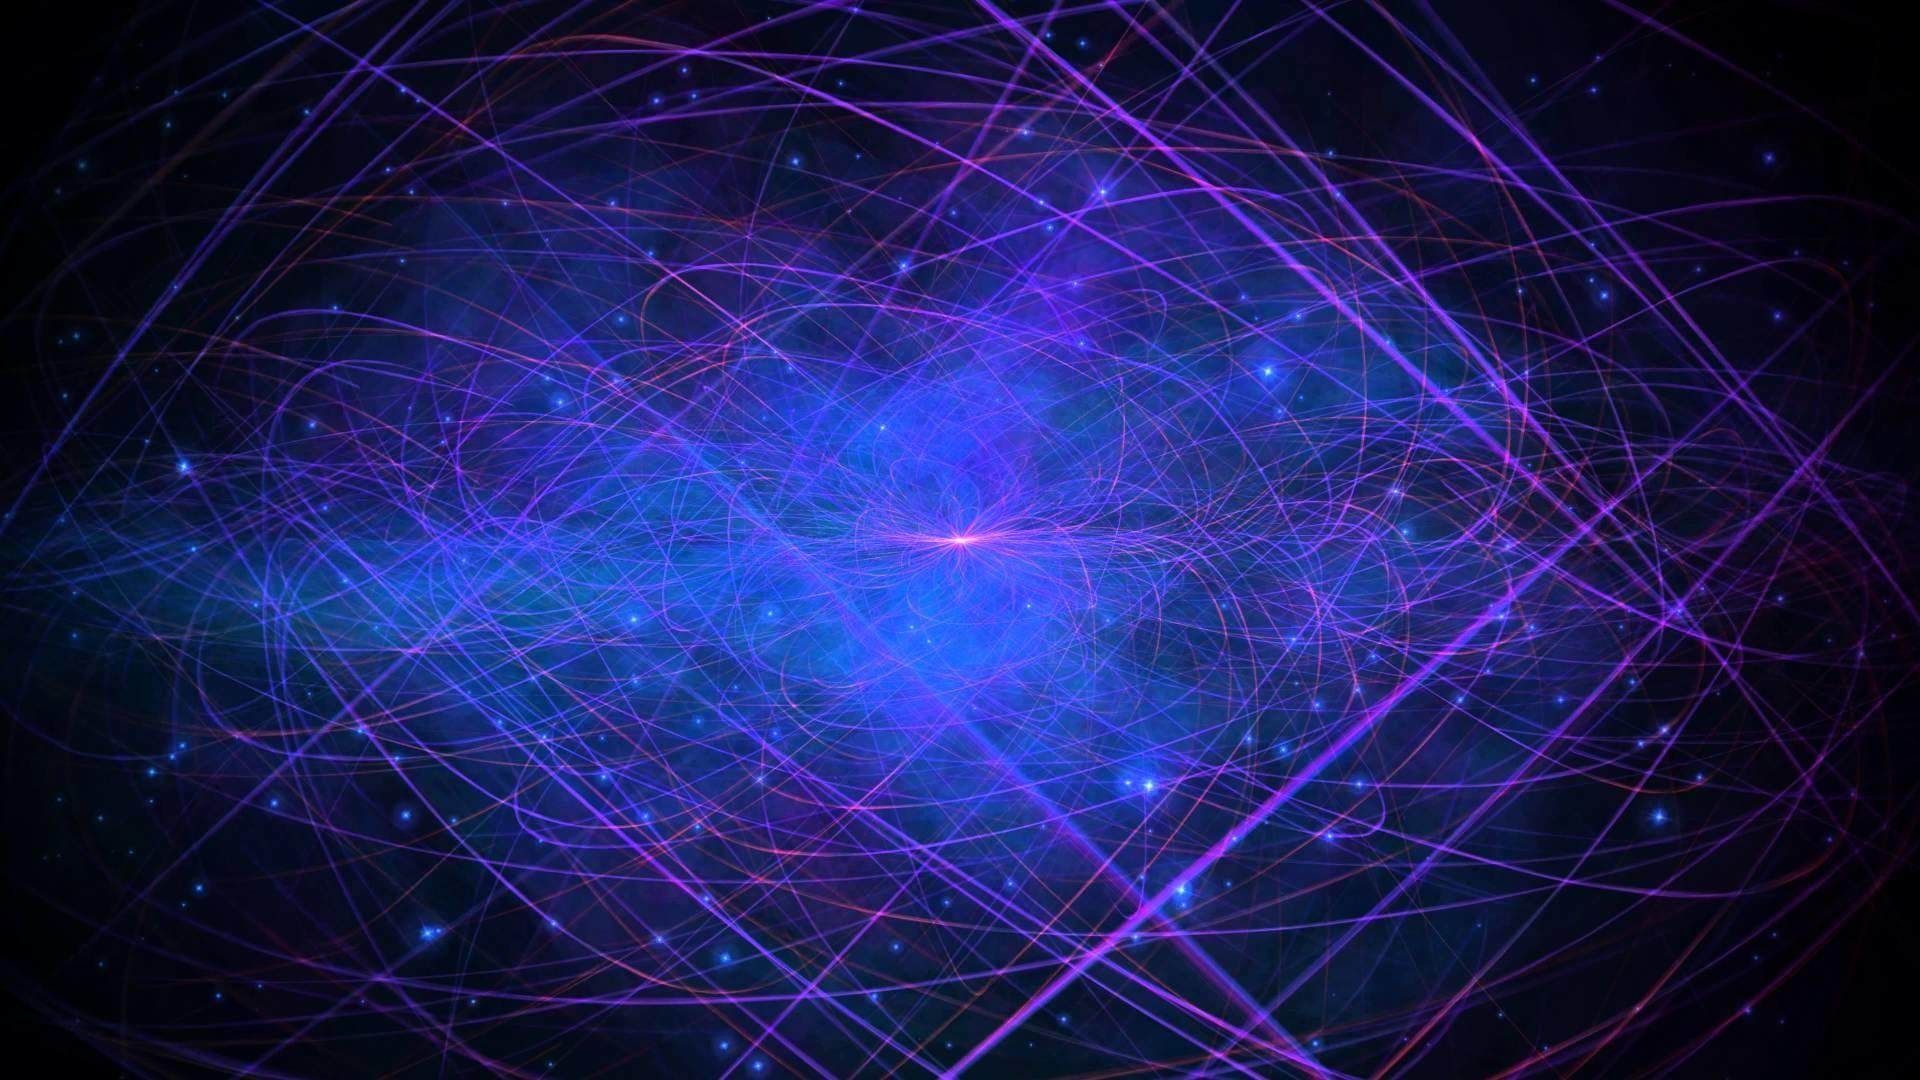 4K Purple Blue Void Slow Space Travel 2160p Motion Background